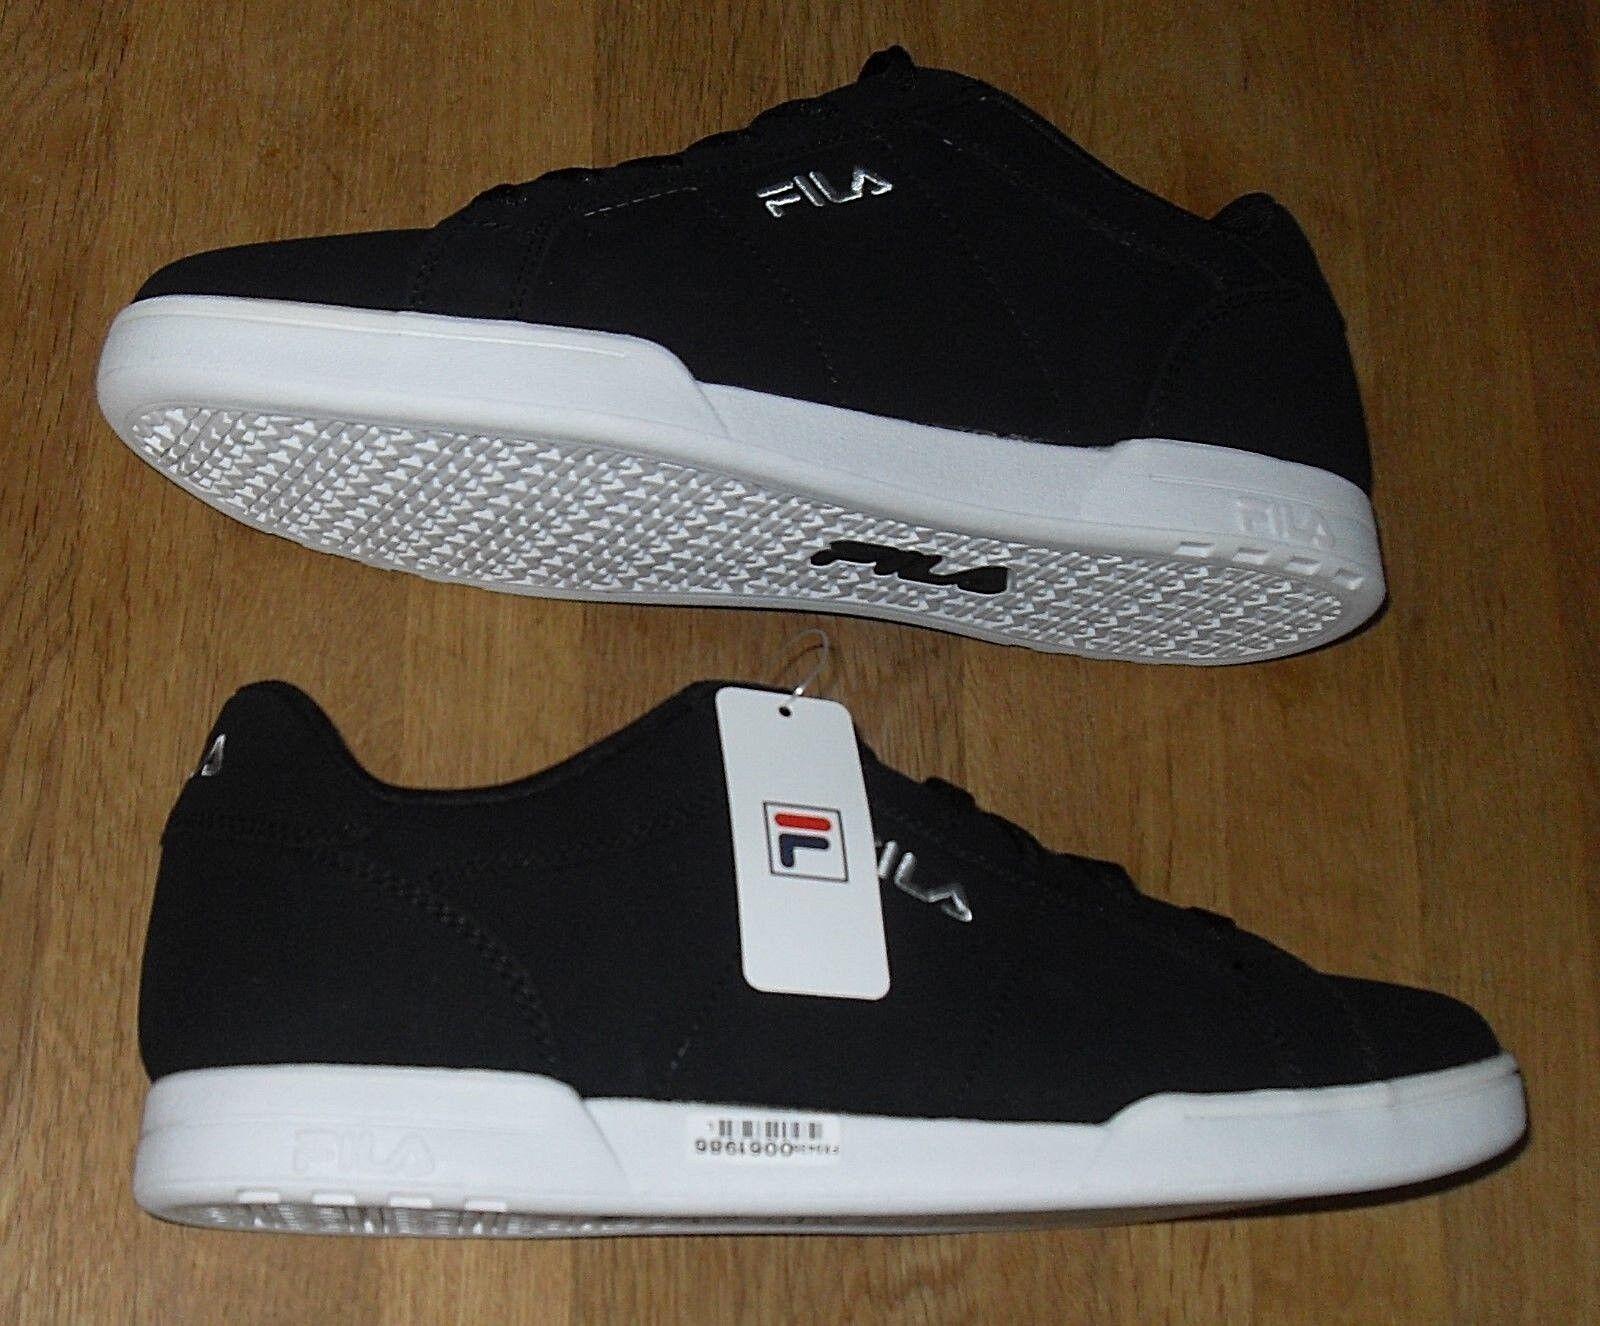 Fila Campora SE Mens Black Trainers Size UK 10